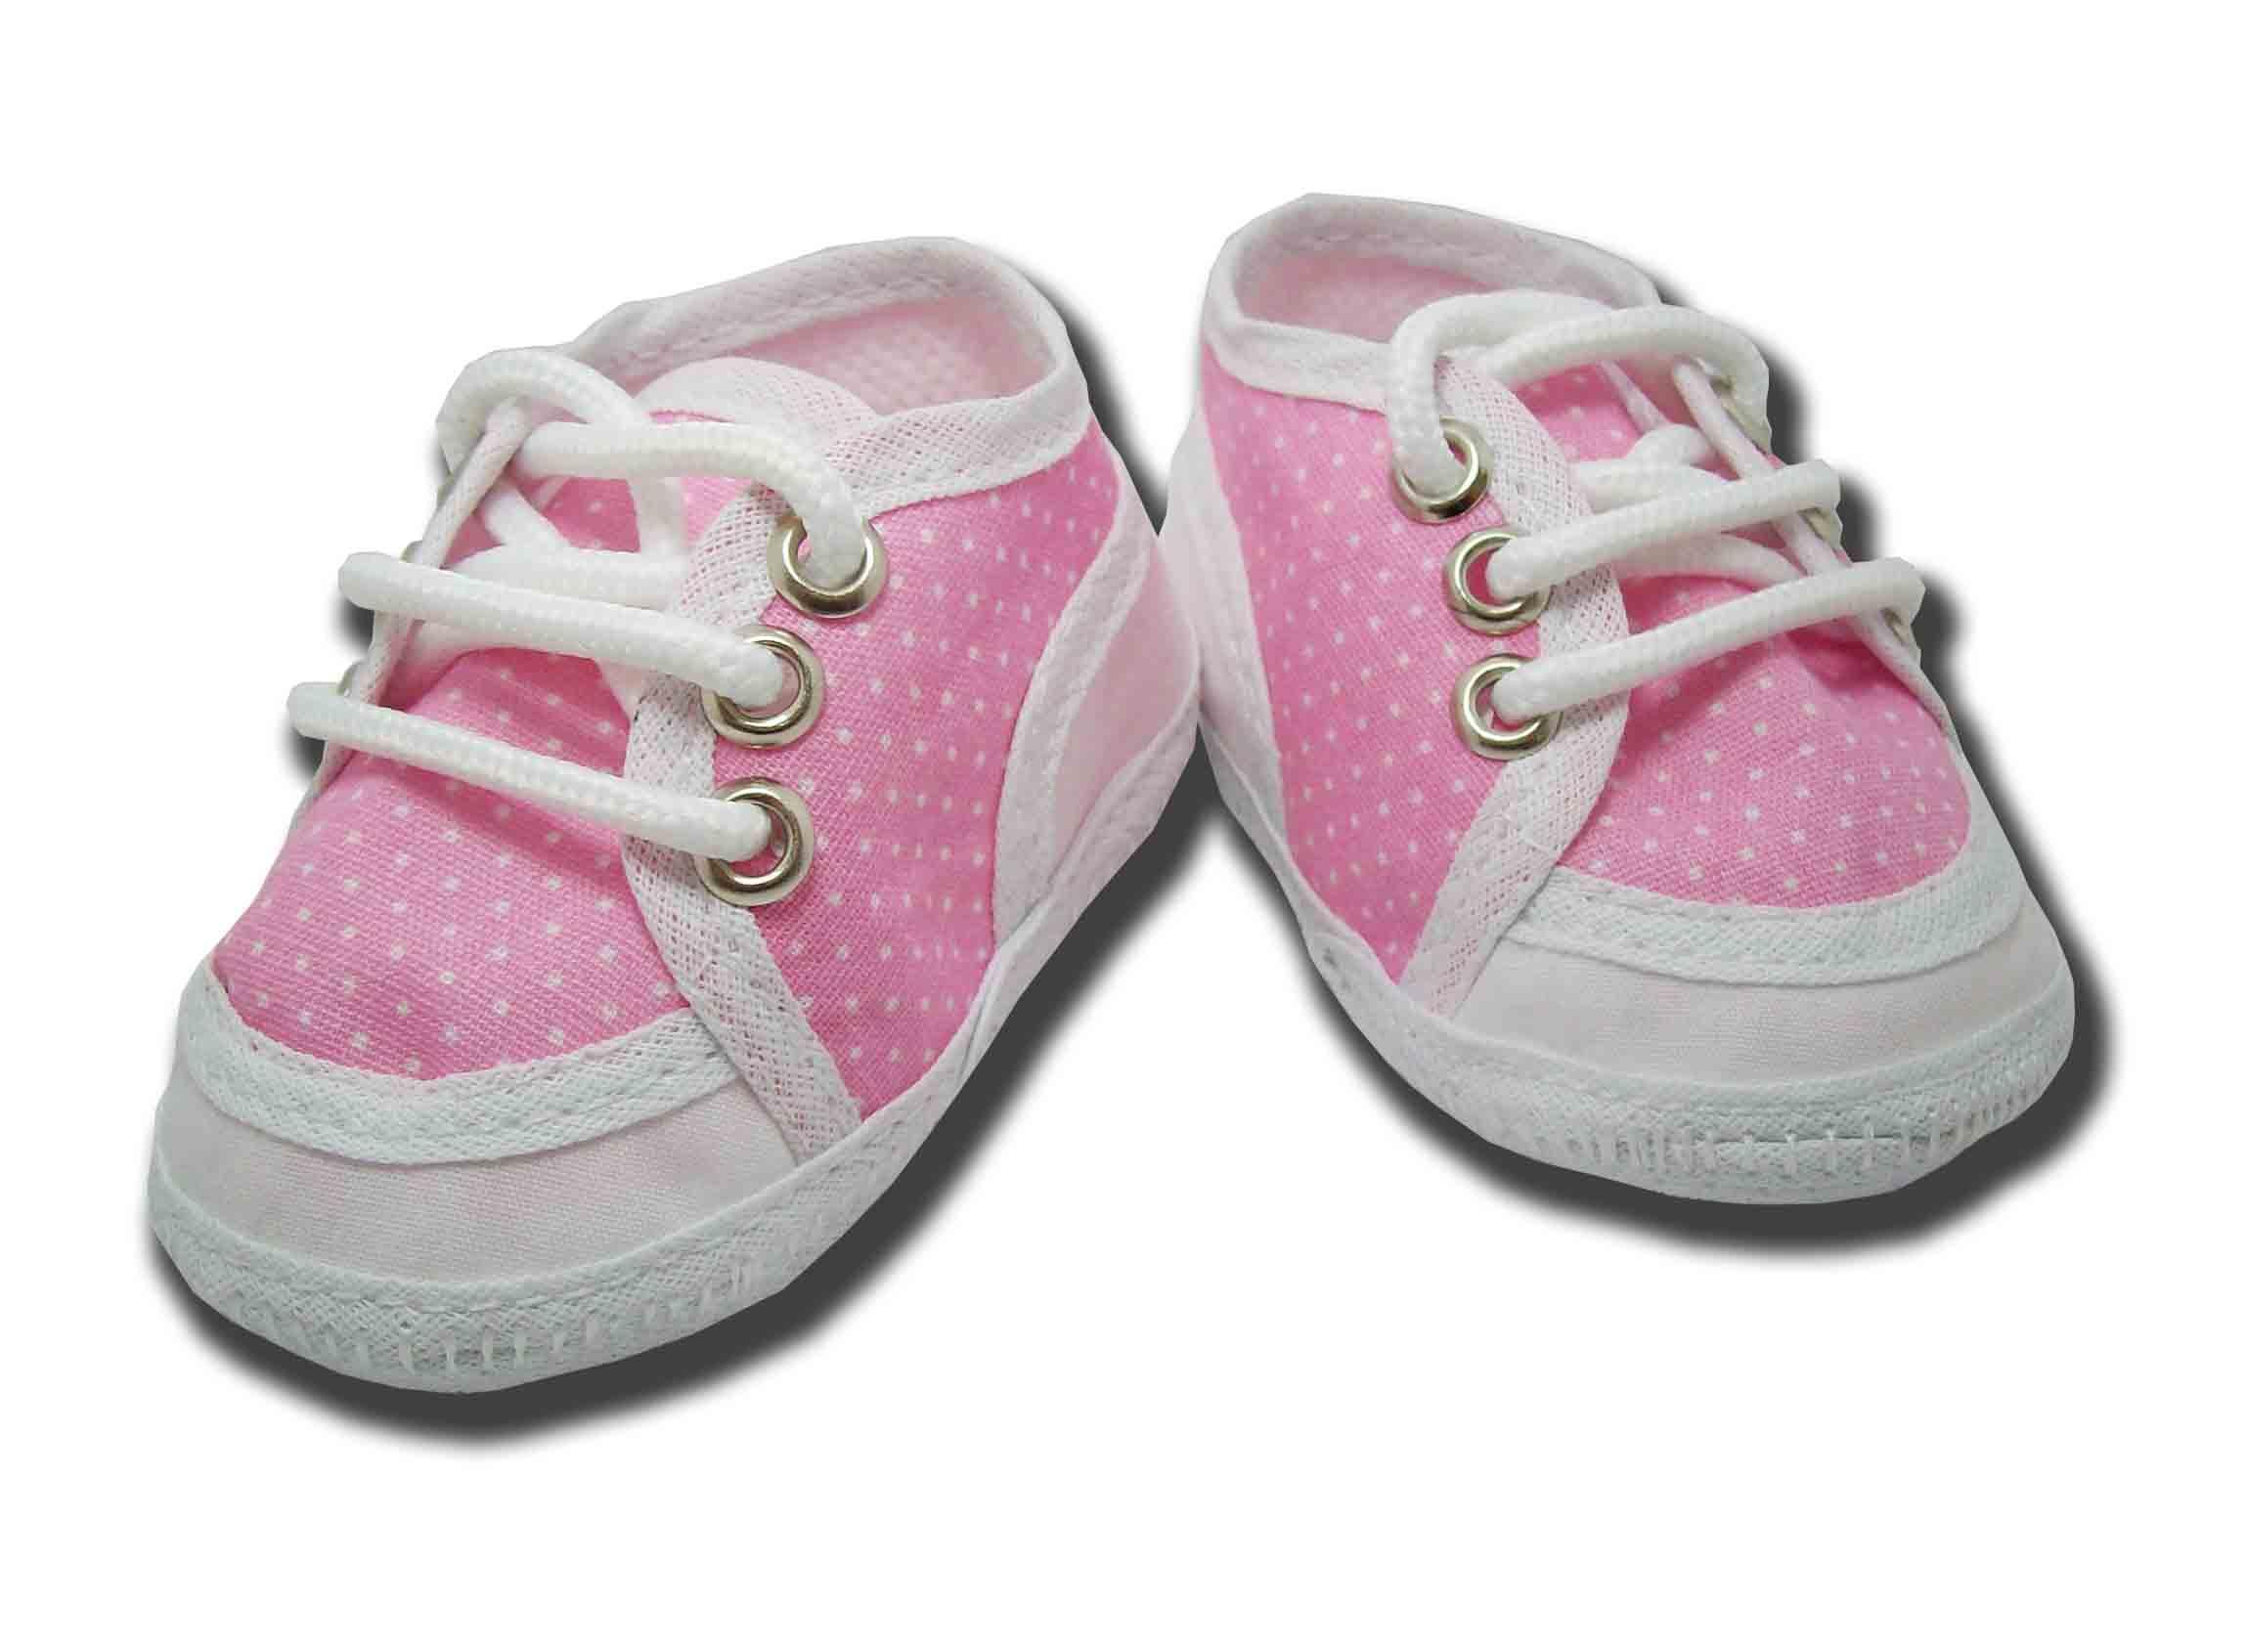 Tenis Feminino Bebe Branco e Rosa  d6a19d354d6b3